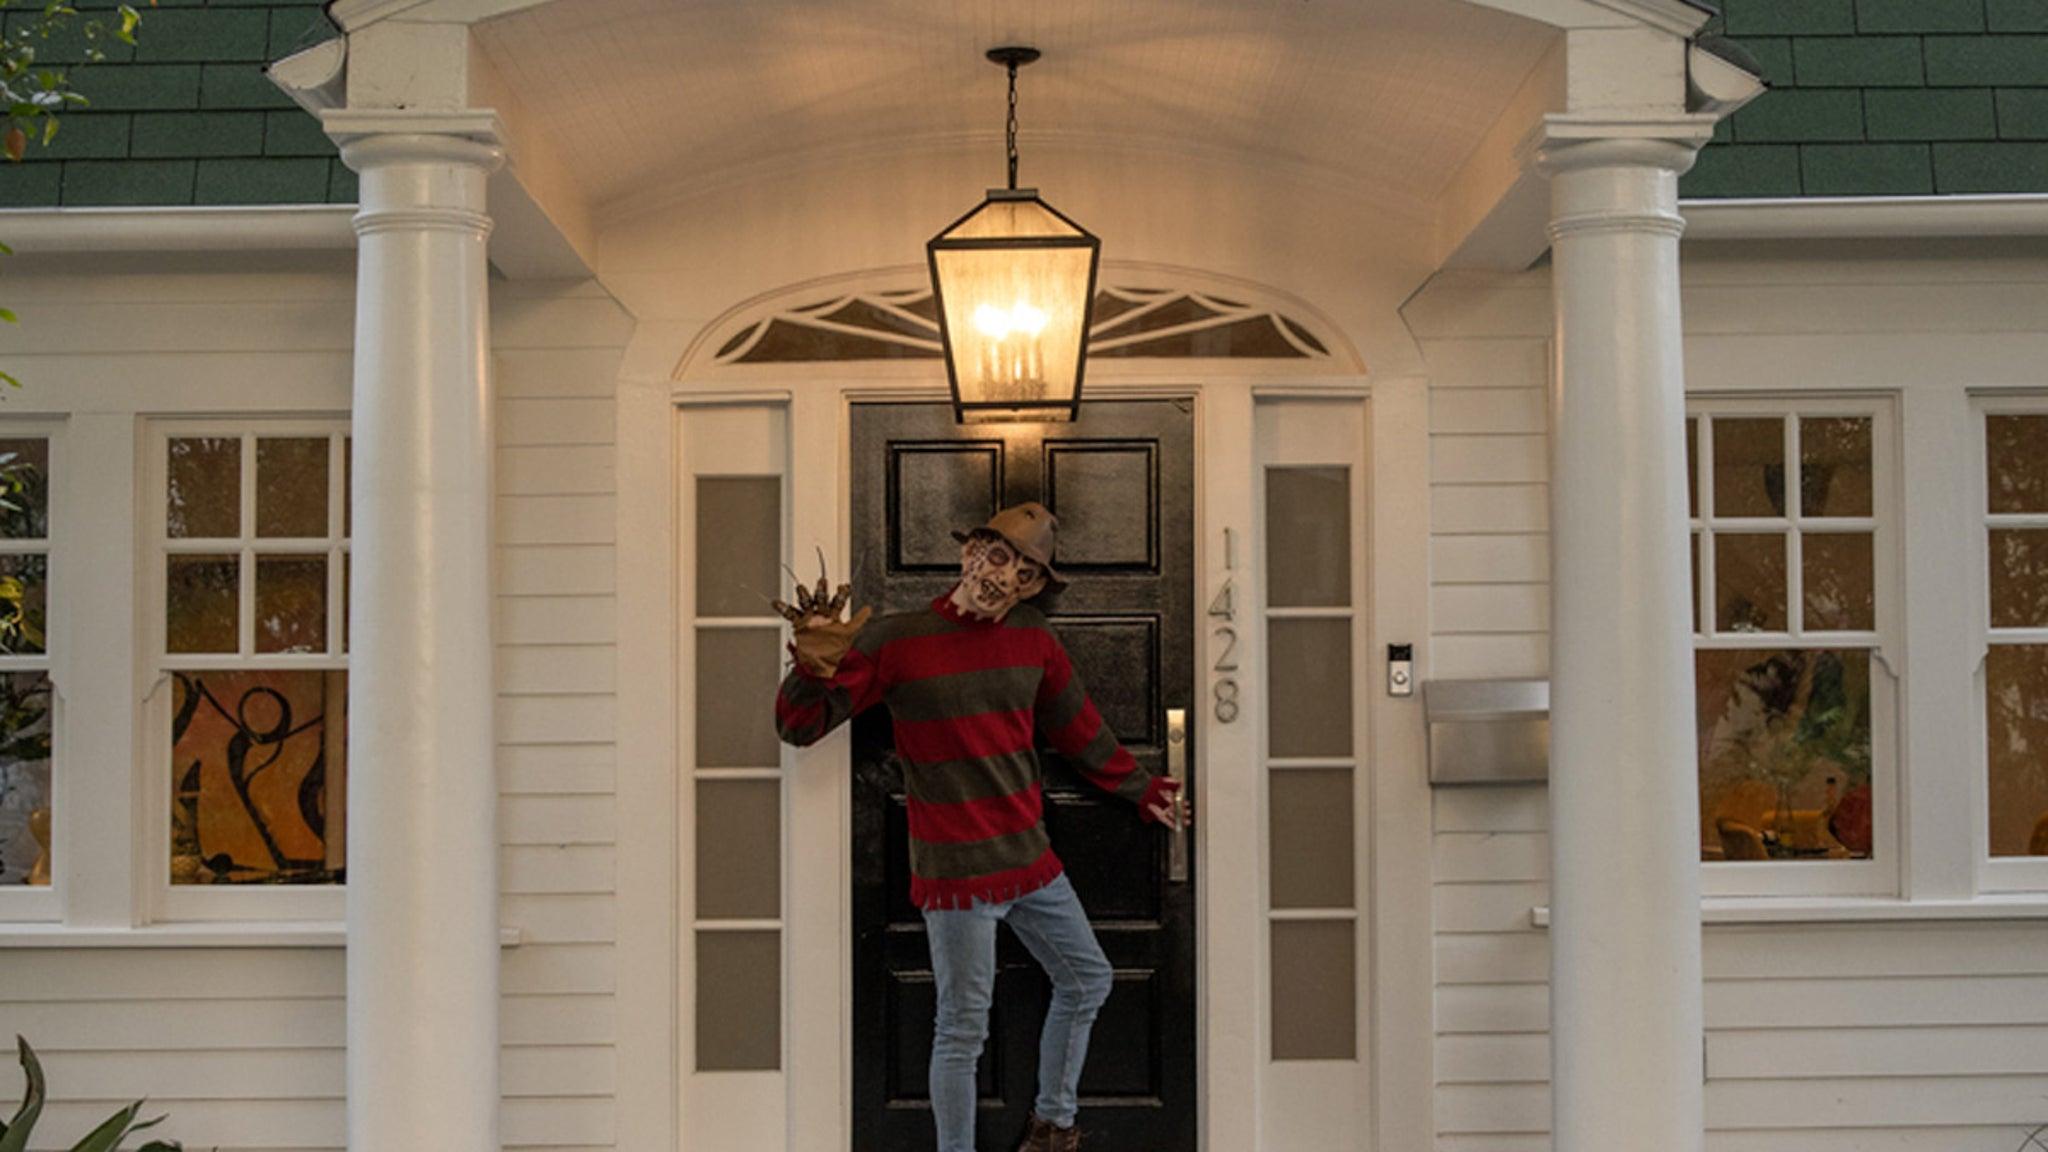 'Nightmare On Elm Street' House For Sale Until Halloween